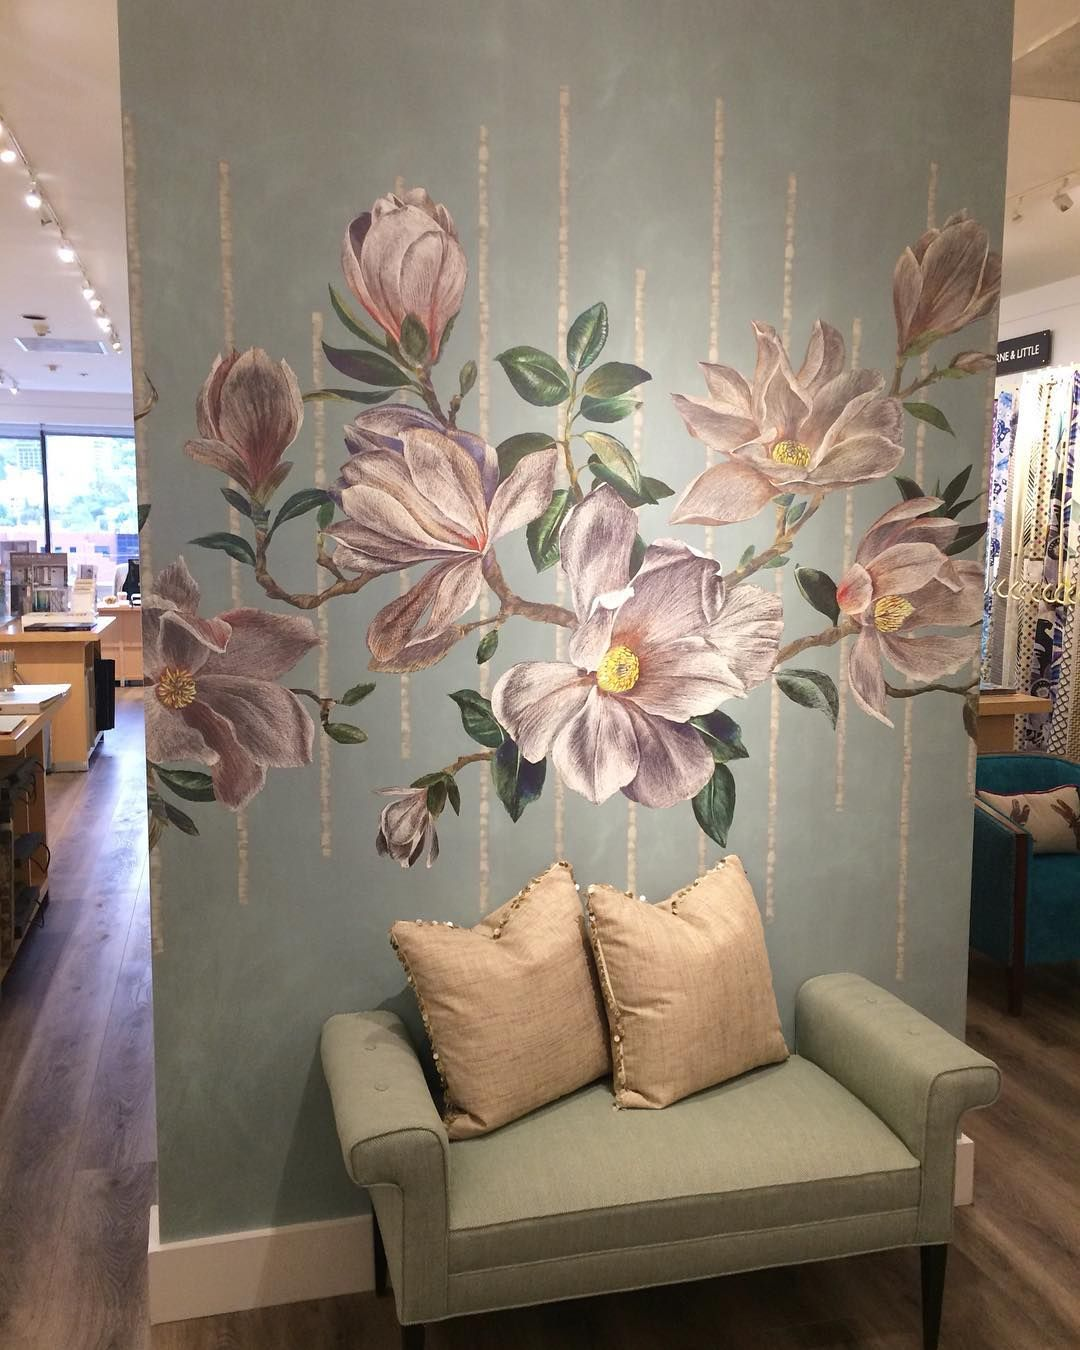 Magnolia Frieze W733801 in 2020 Osborne, little